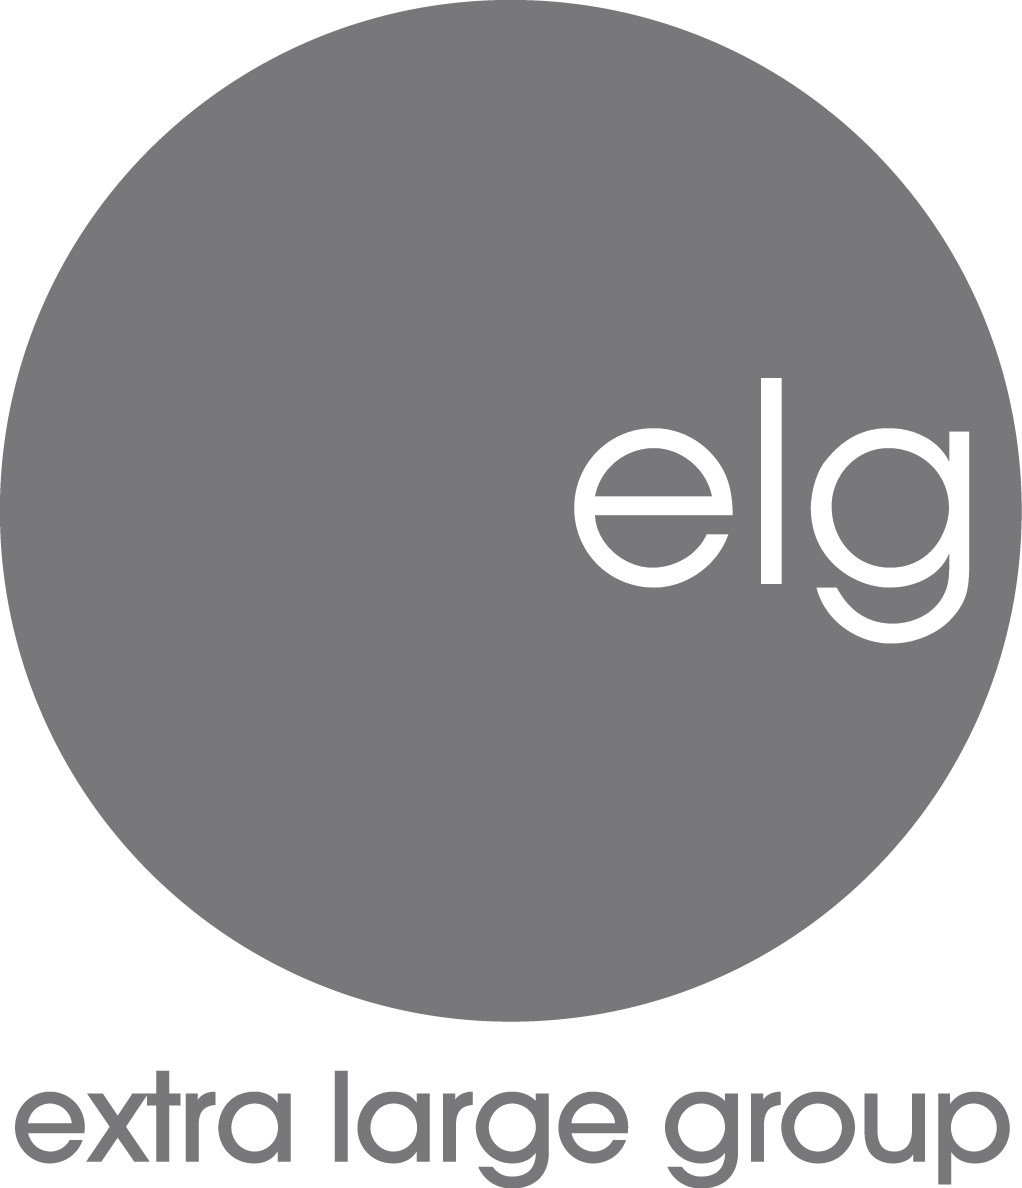 EXTRA LARGE GROUP